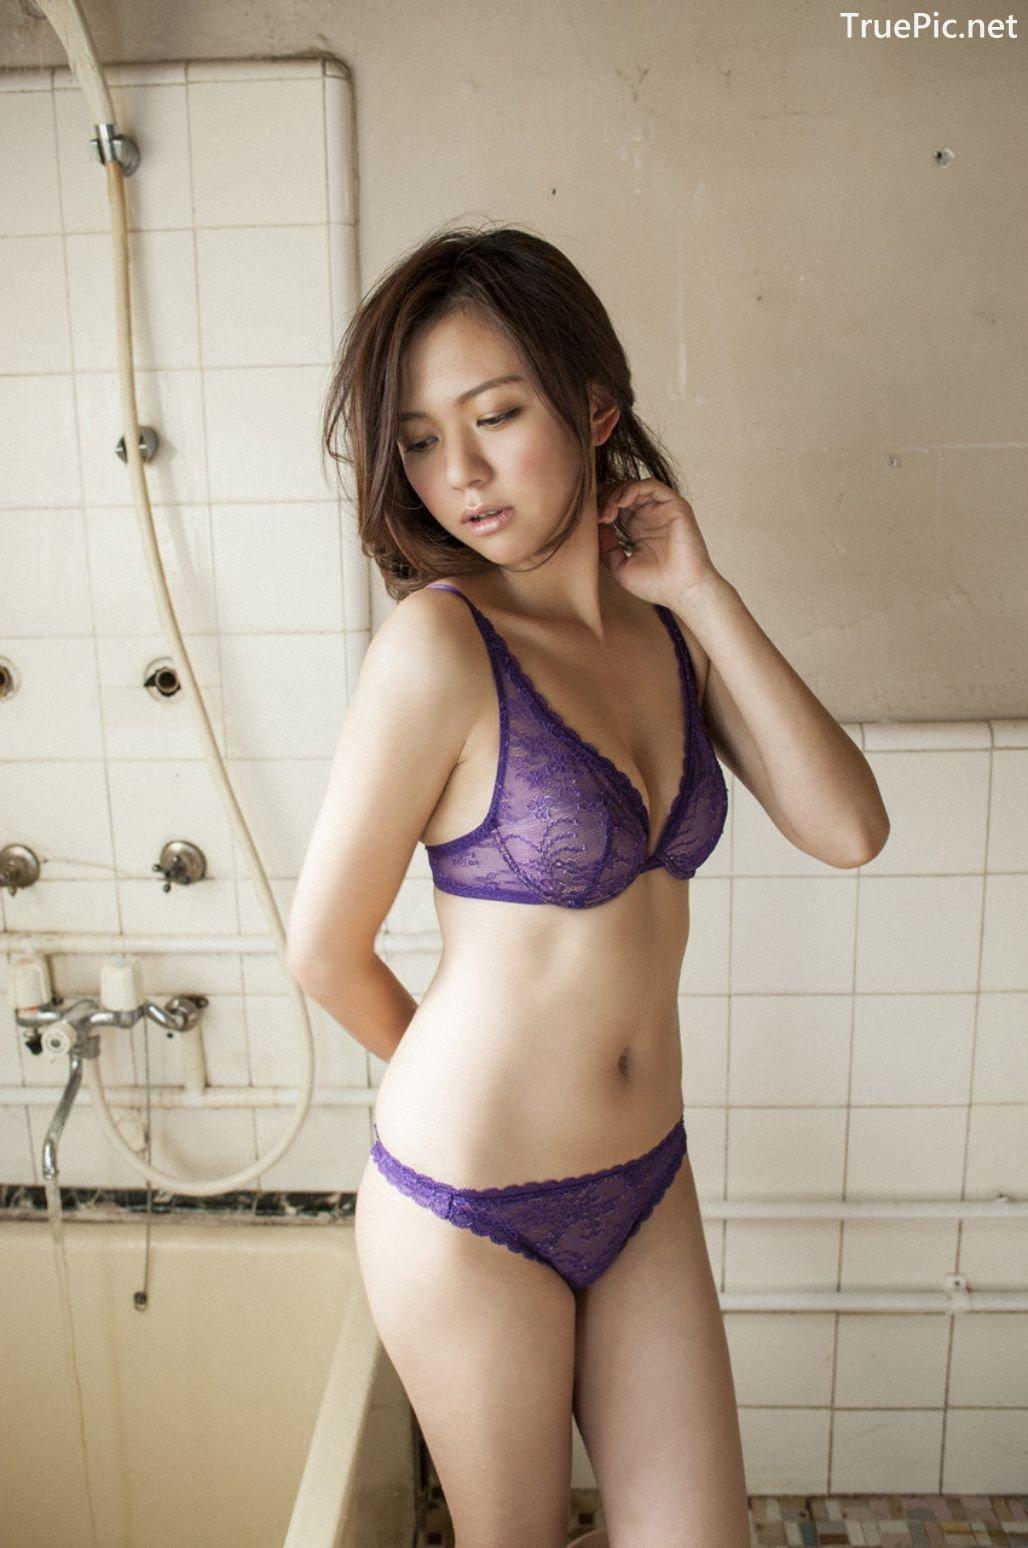 Image-Japanese-Actress-And-Model-Yuka-Konan-Hot-Beauty-Of-Angel-TruePic.net- Picture-9